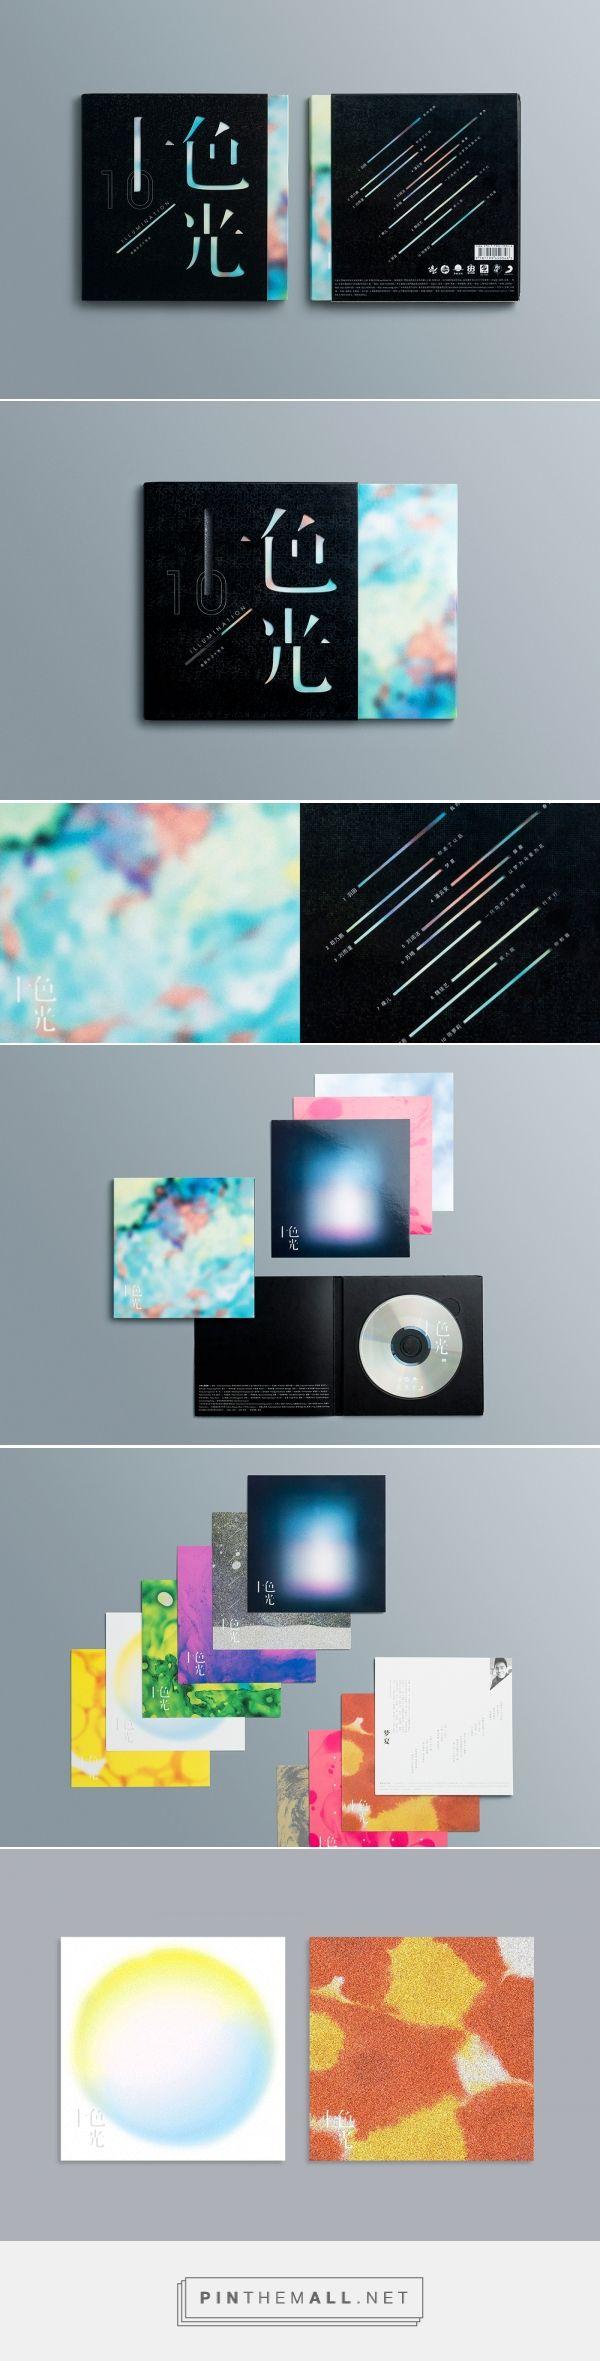 606 best CD Packaging images on Pinterest | Graphics, Design ...